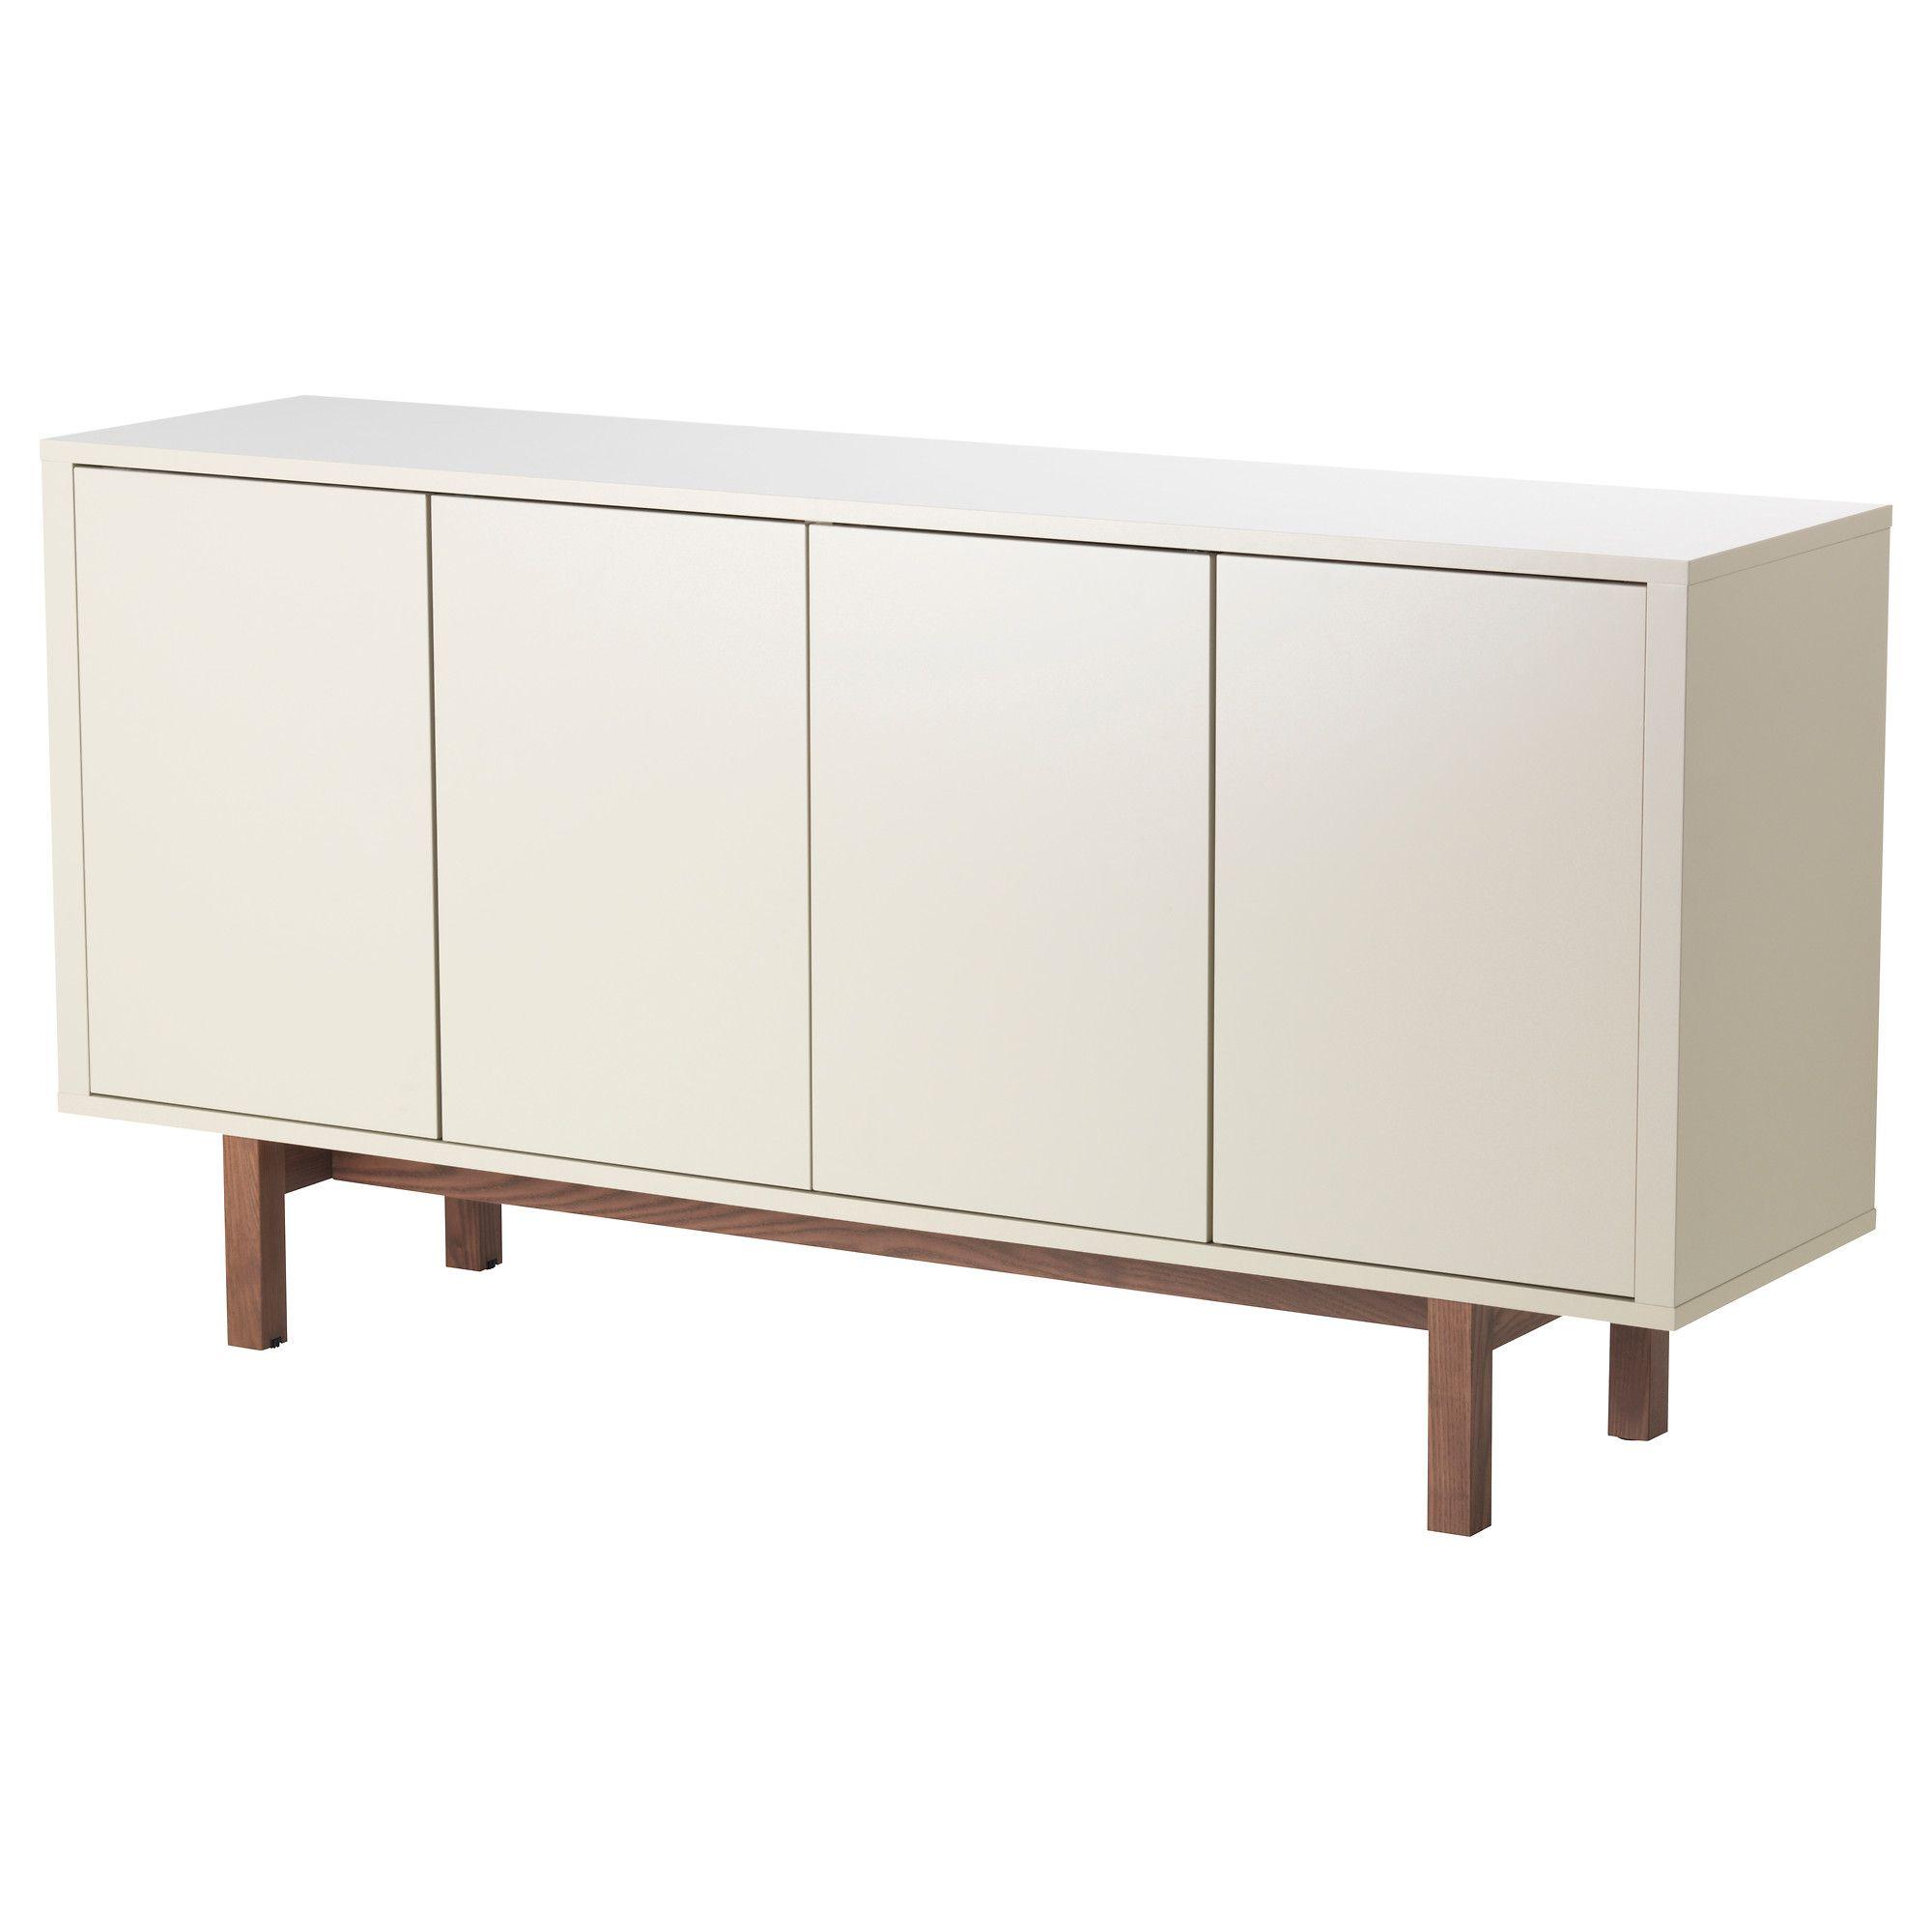 Full Size of Fresh Home Furnishing Ideas And Affordable Furniture Ikea Betten 160x200 Wohnzimmer Sideboard Küche Bei Sofa Mit Schlaffunktion Kaufen Kosten Arbeitsplatte Wohnzimmer Sideboard Ikea